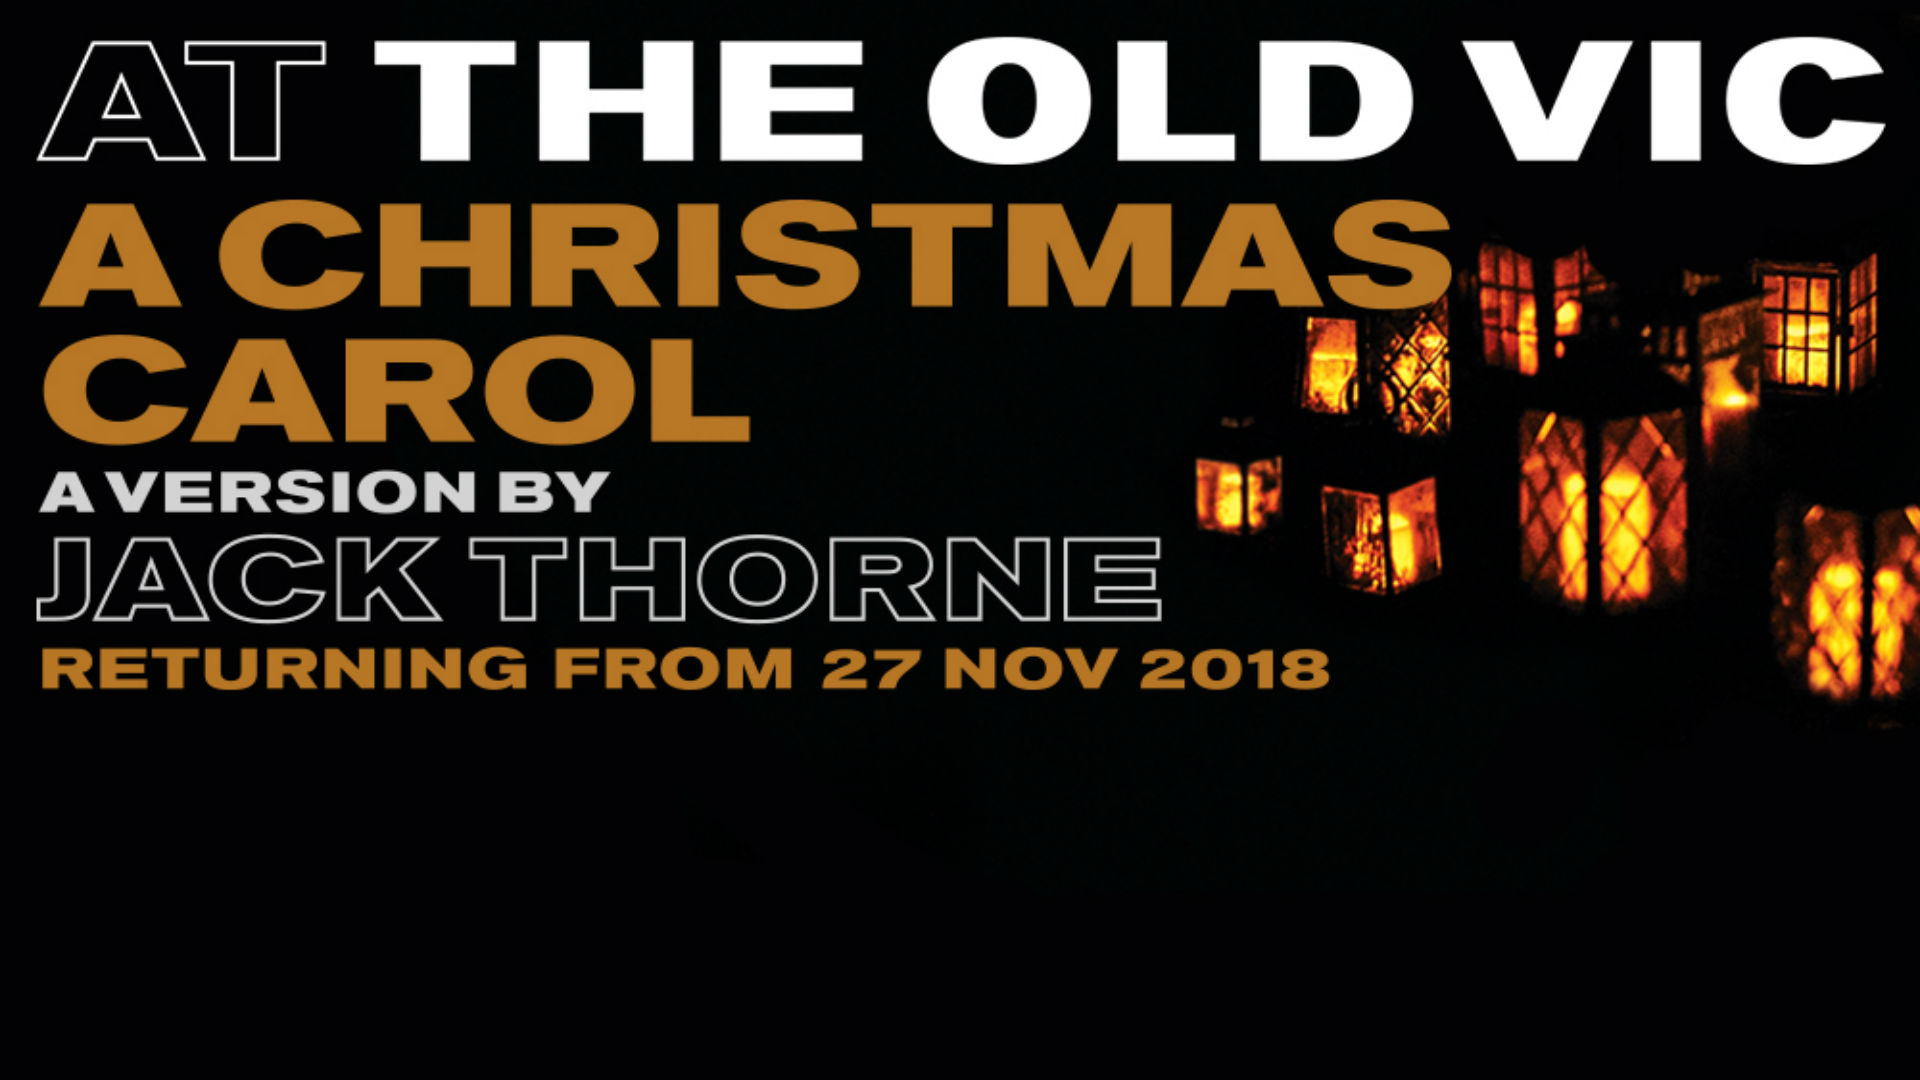 e81143ef512af A Christmas Carol at The Old Vic - Play - visitlondon.com